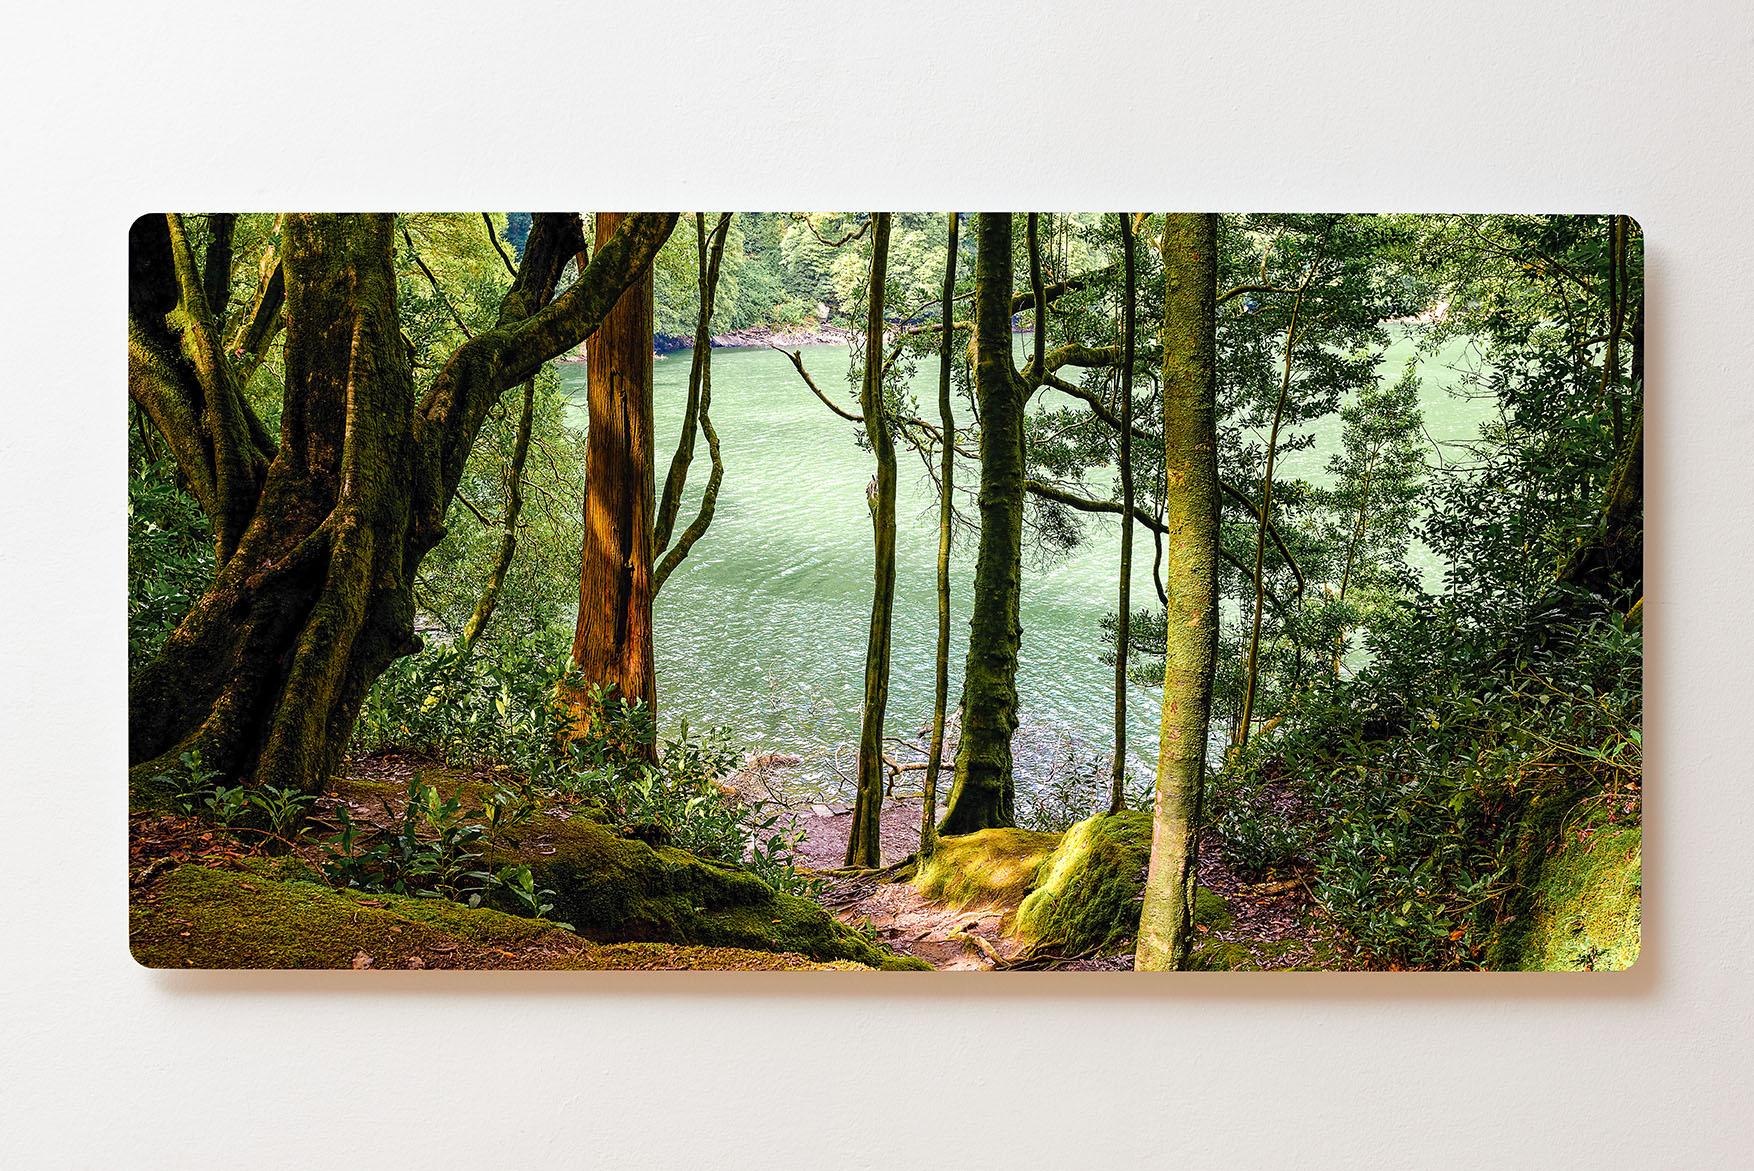 Magnettafel BACKLIGHT 120x60cm Motiv-Wandbild M157 See Wald